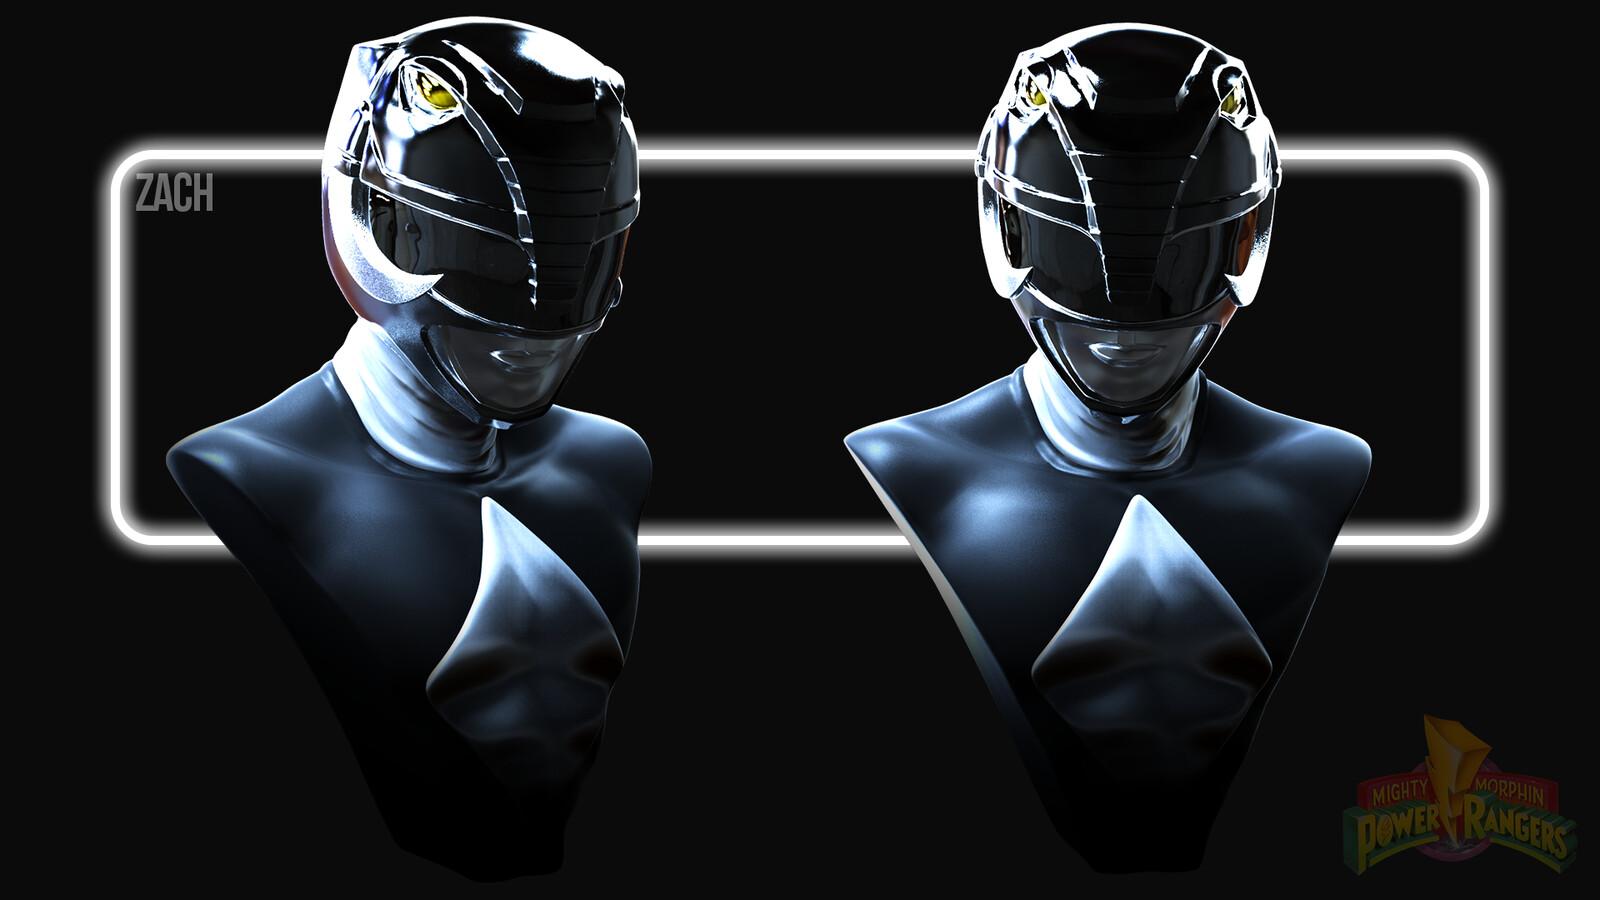 Zachary Taylor the Black Power Ranger